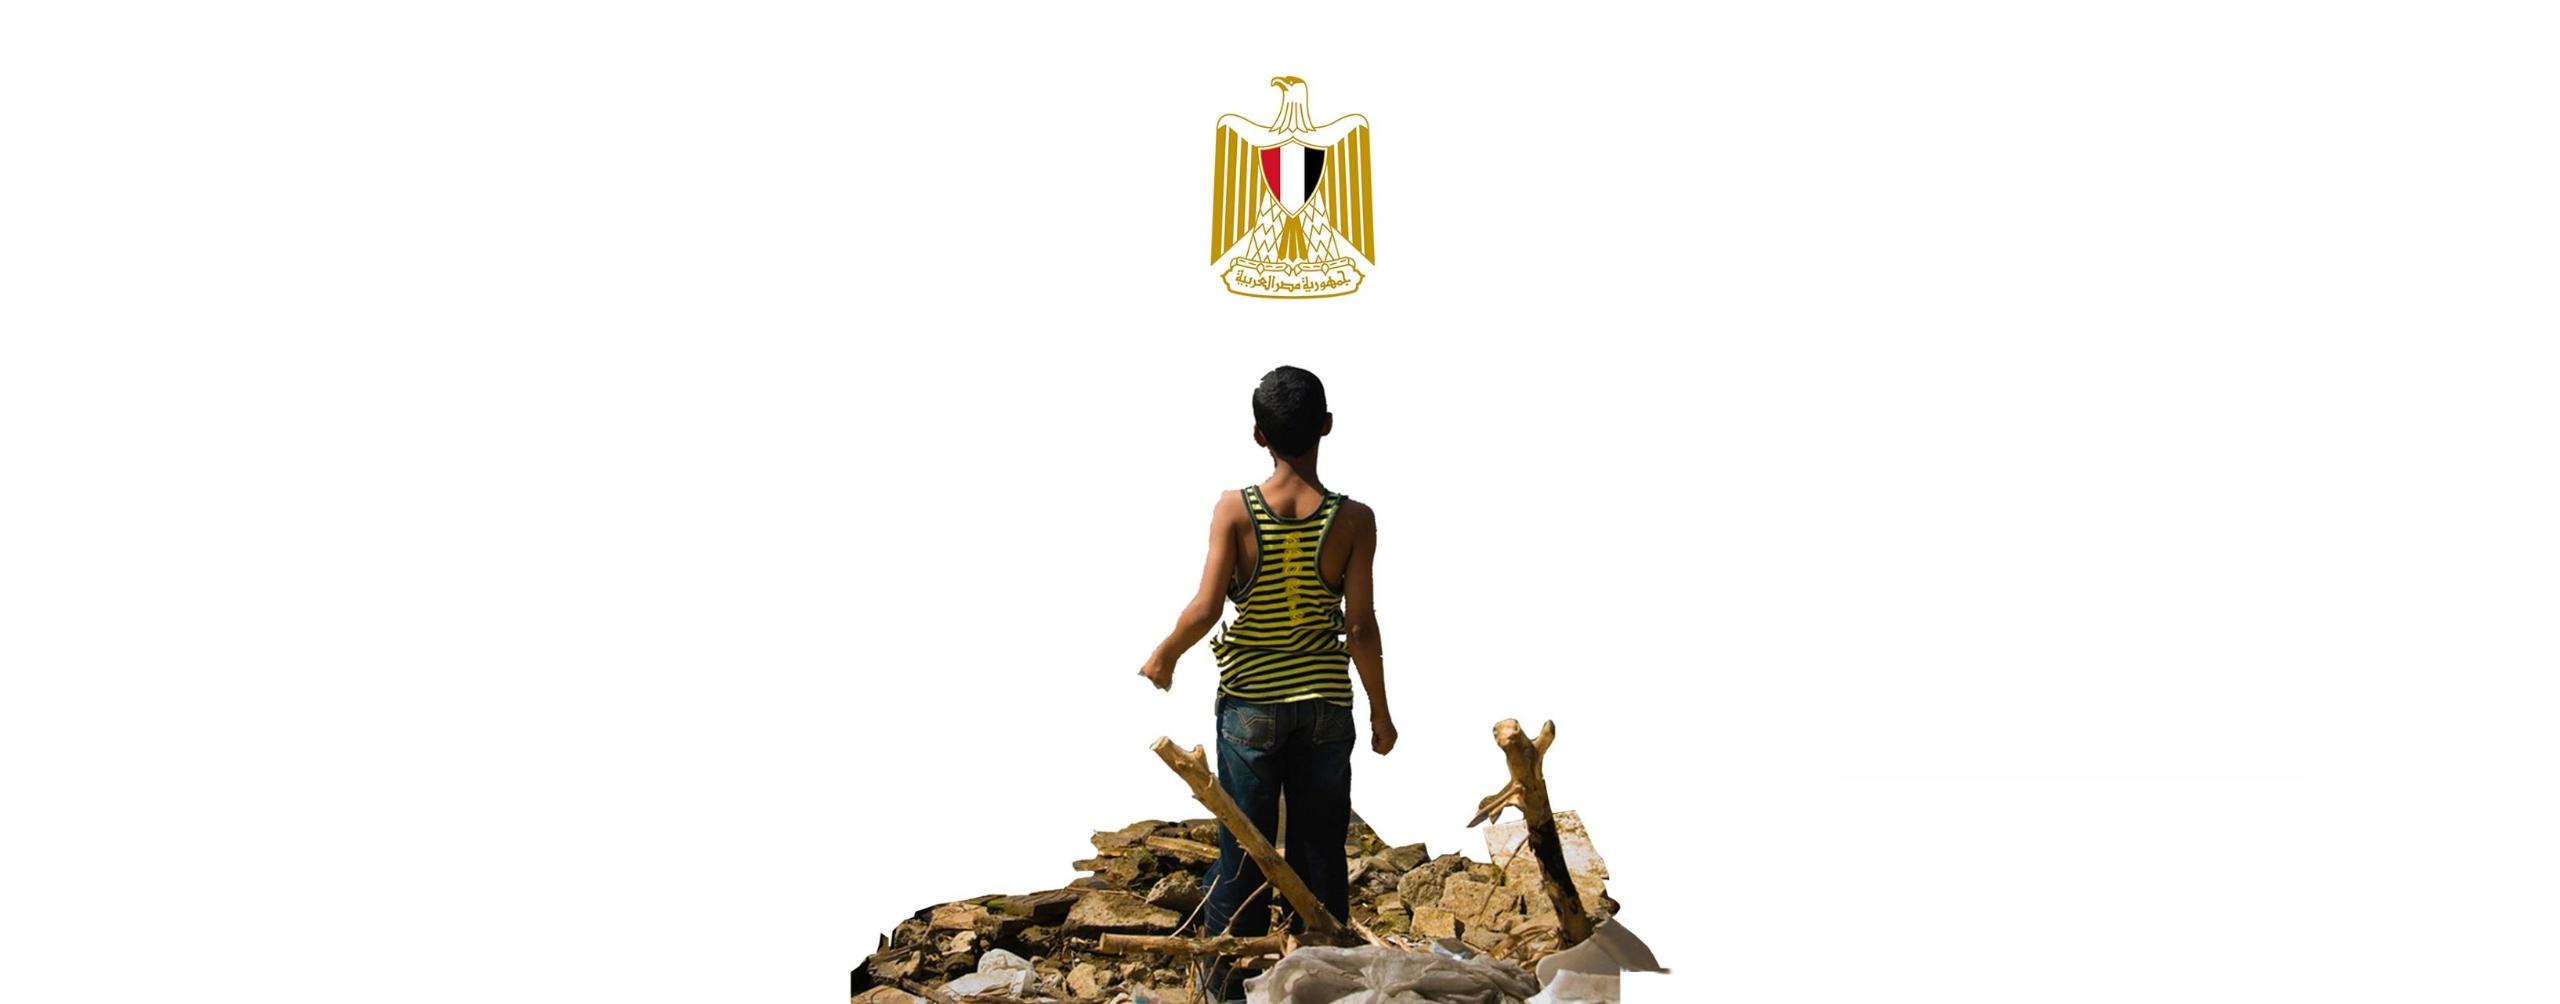 Hussin Moahmed (@hussin_mohamed) Cover Image